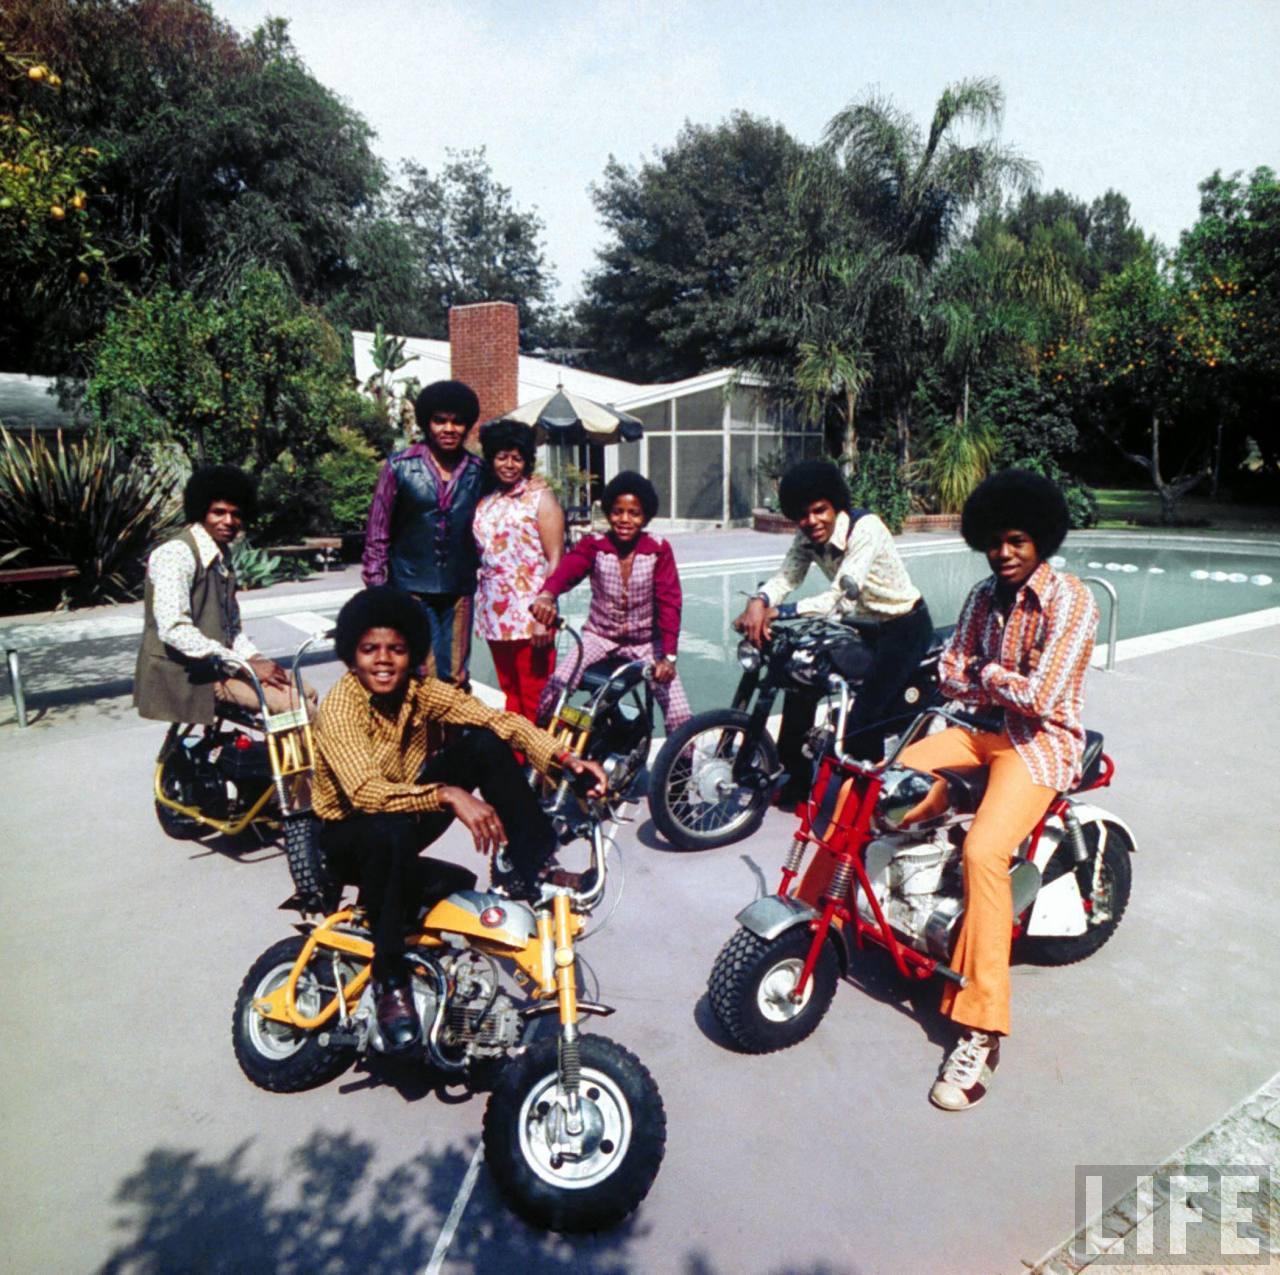 http://3.bp.blogspot.com/-Ayft8F1EJM8/TixQG96RdXI/AAAAAAAADQI/7_aAHKWc2j4/s1600/michael-jackson-family-life.jpg